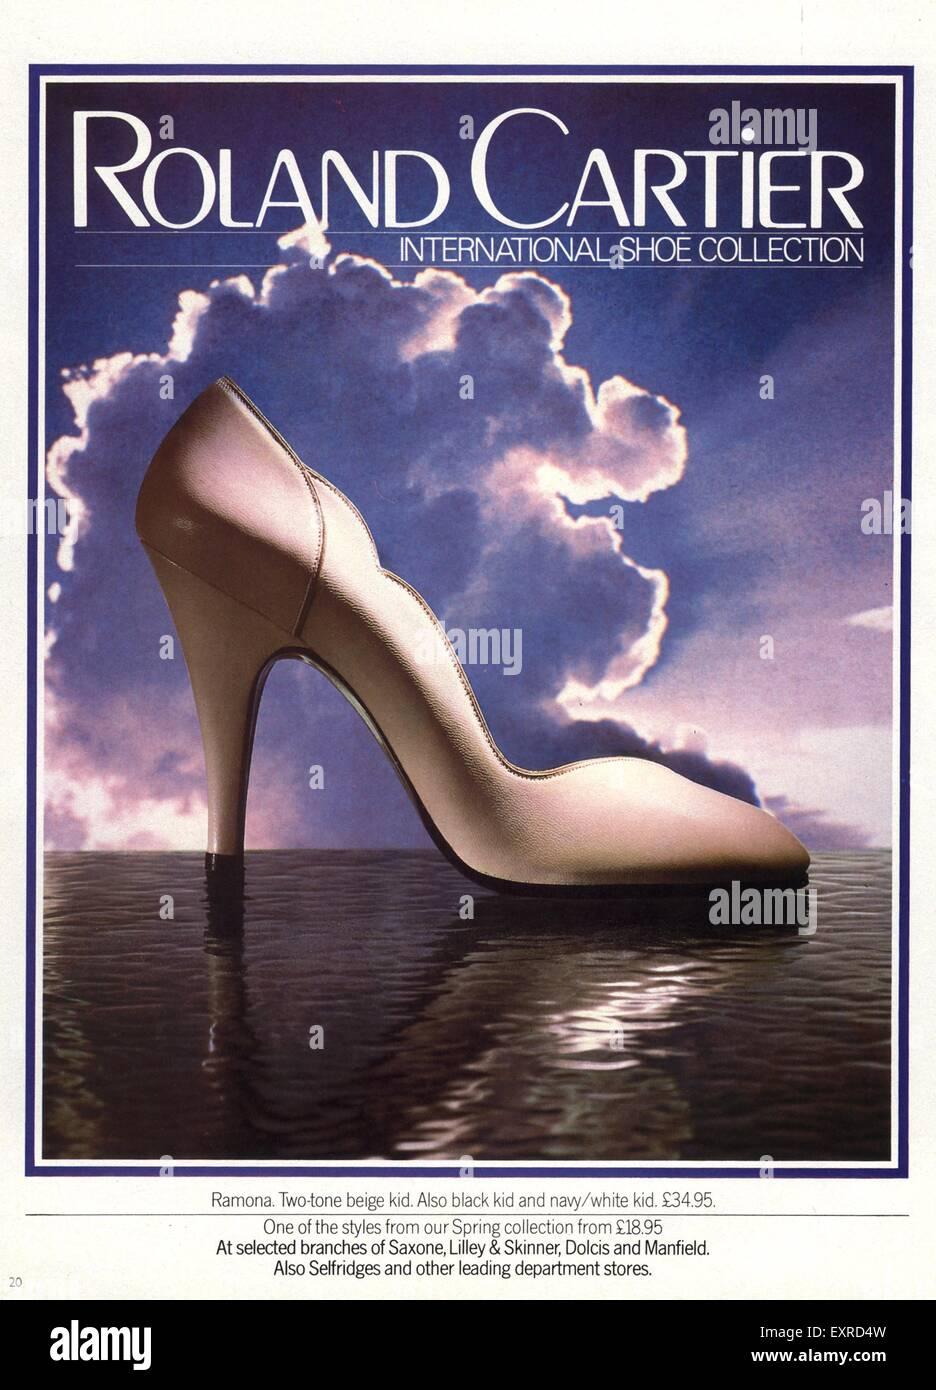 1980s UK Roland Cartier Magazine Advert - Stock Image